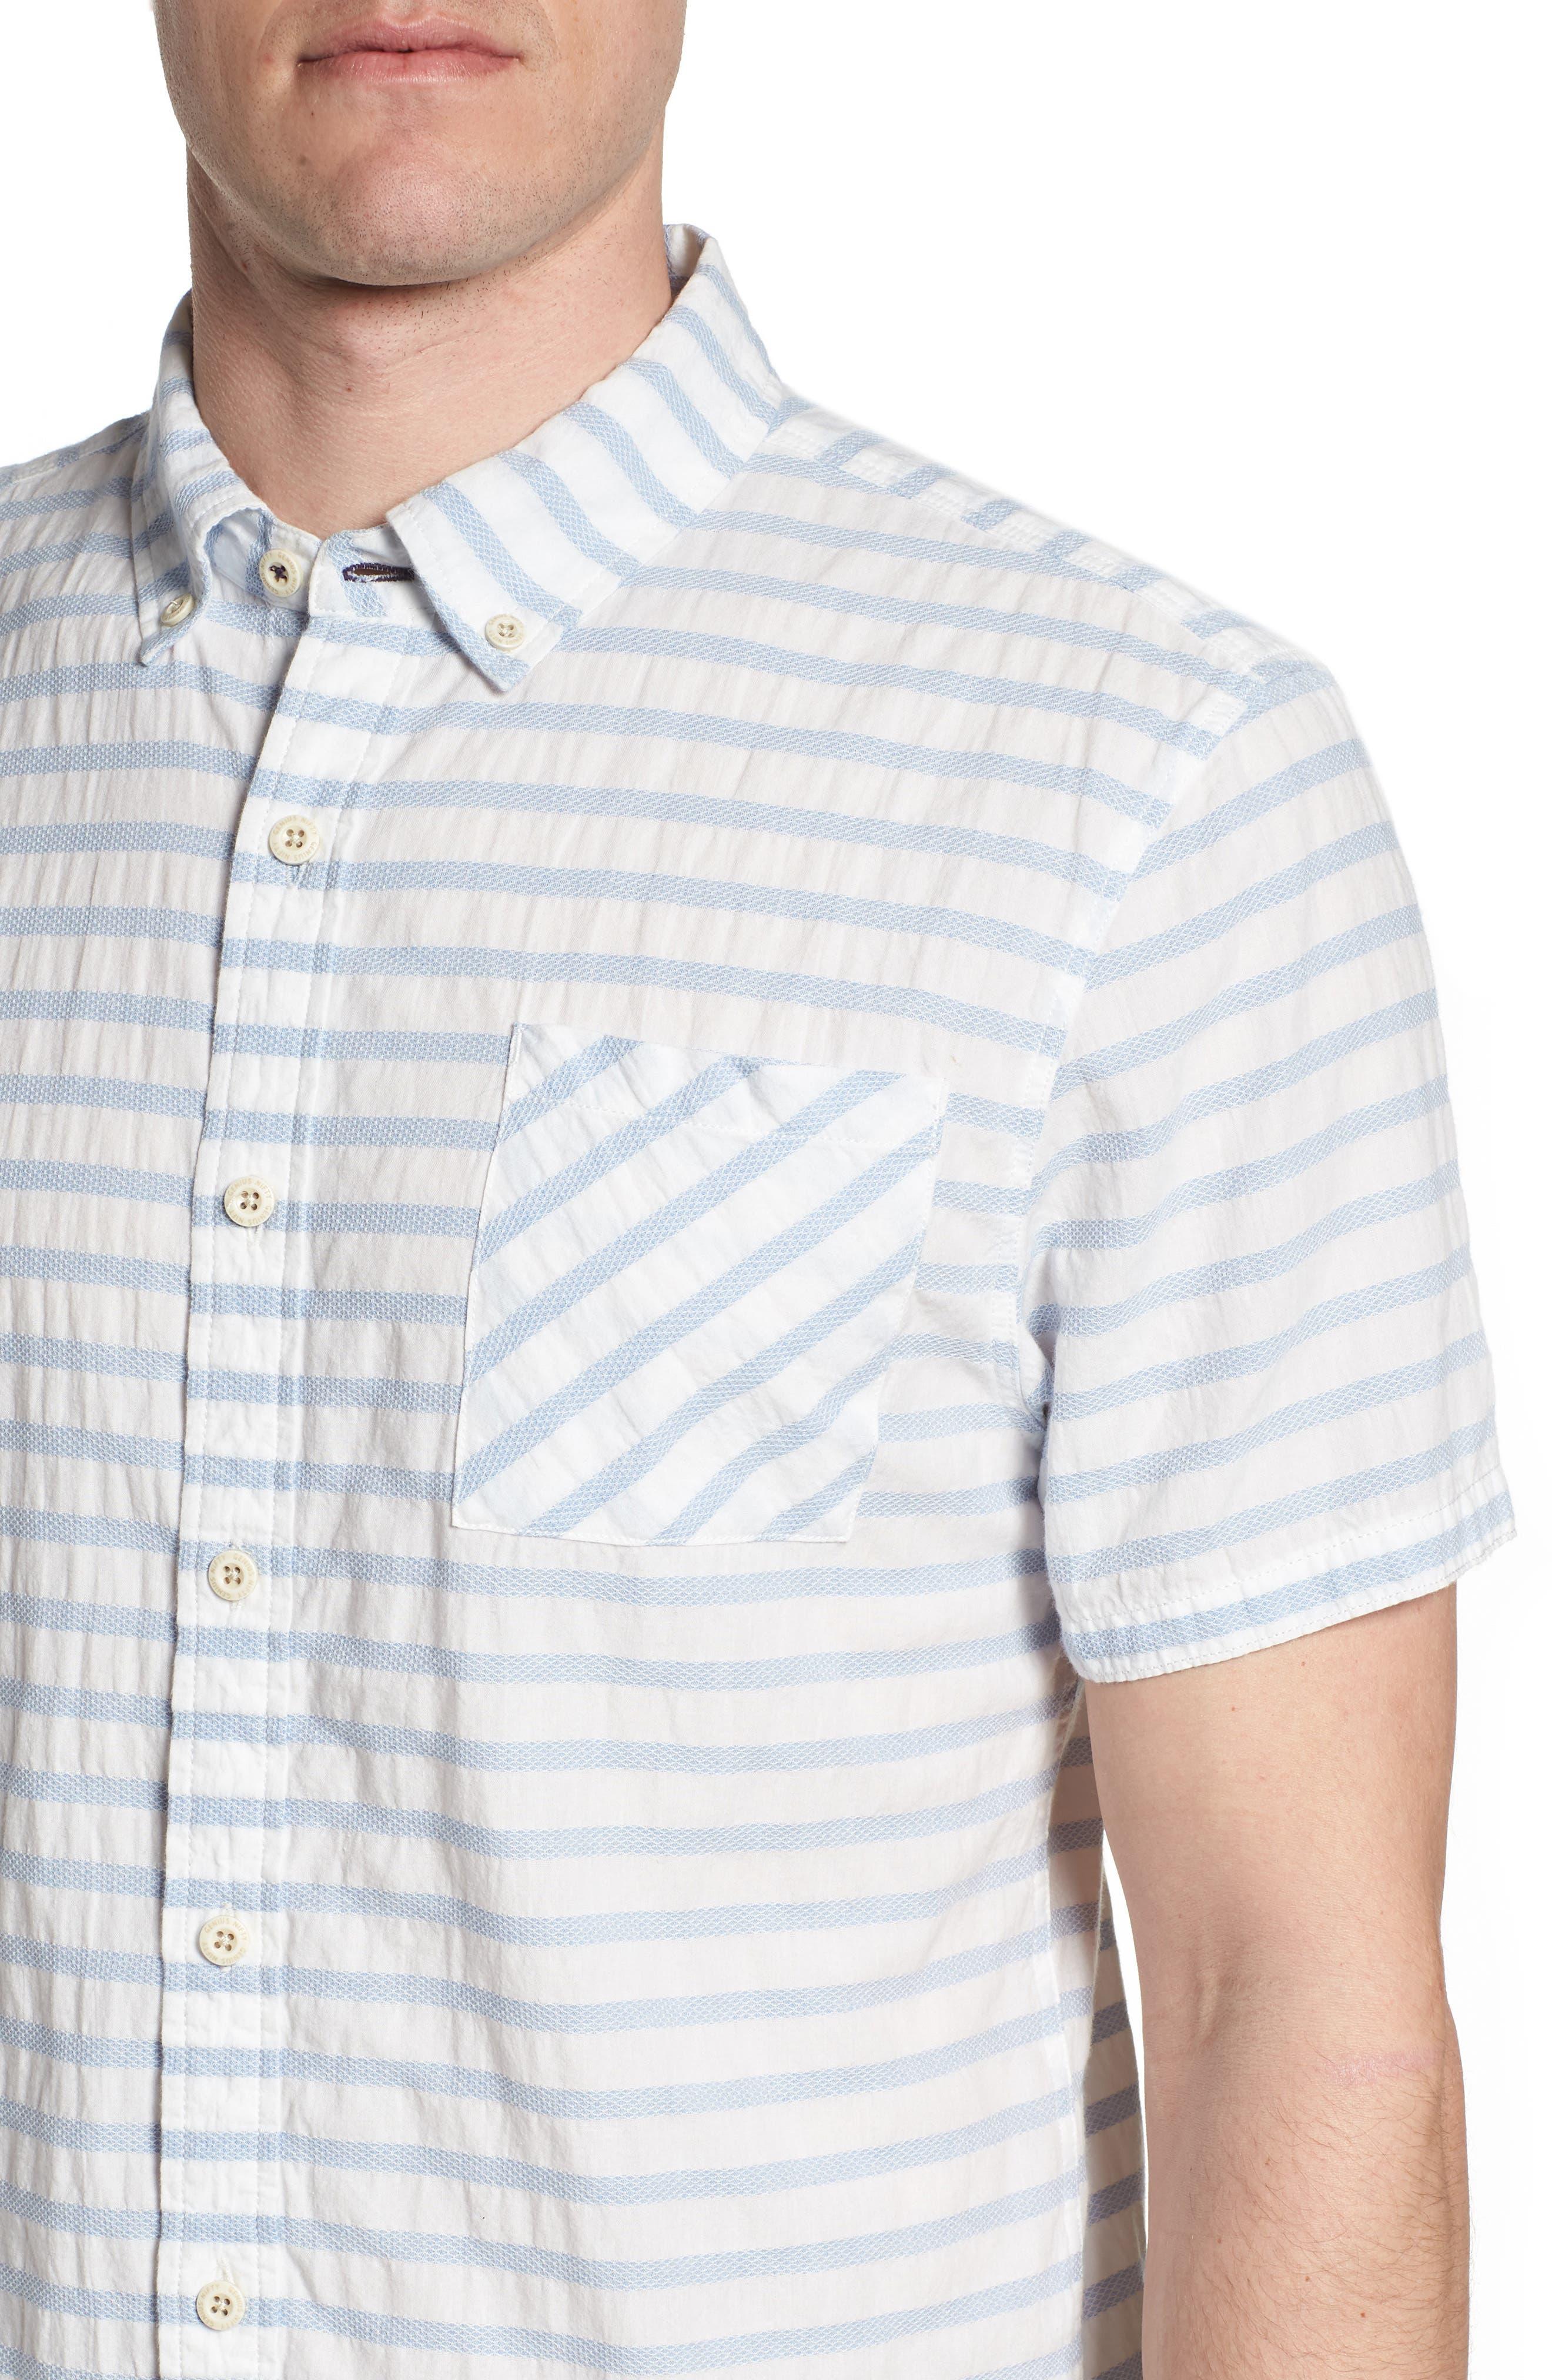 Truman Slim Fit Stripe Sport Shirt,                             Alternate thumbnail 2, color,                             White/ Blue